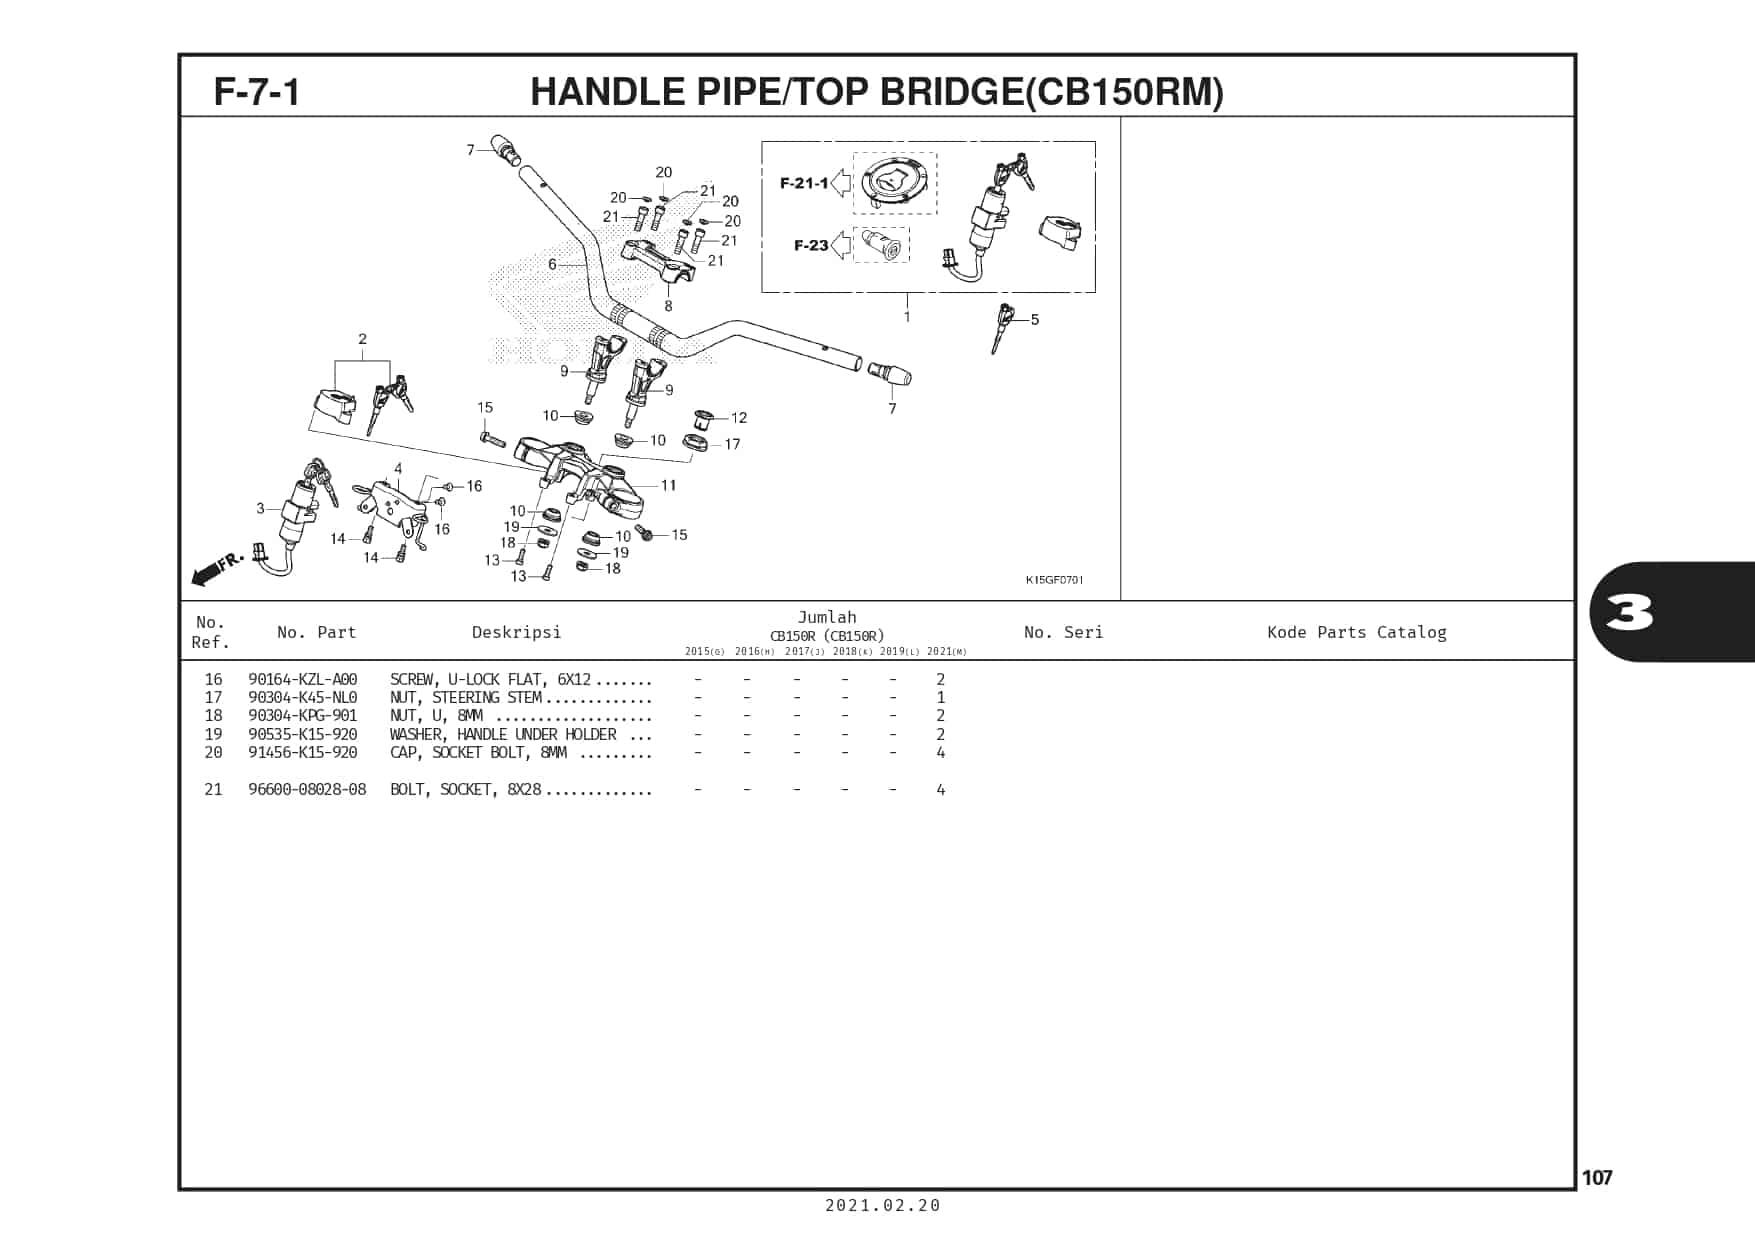 F-7-1 Handle Pipe/Top Bridge (CB150RM)